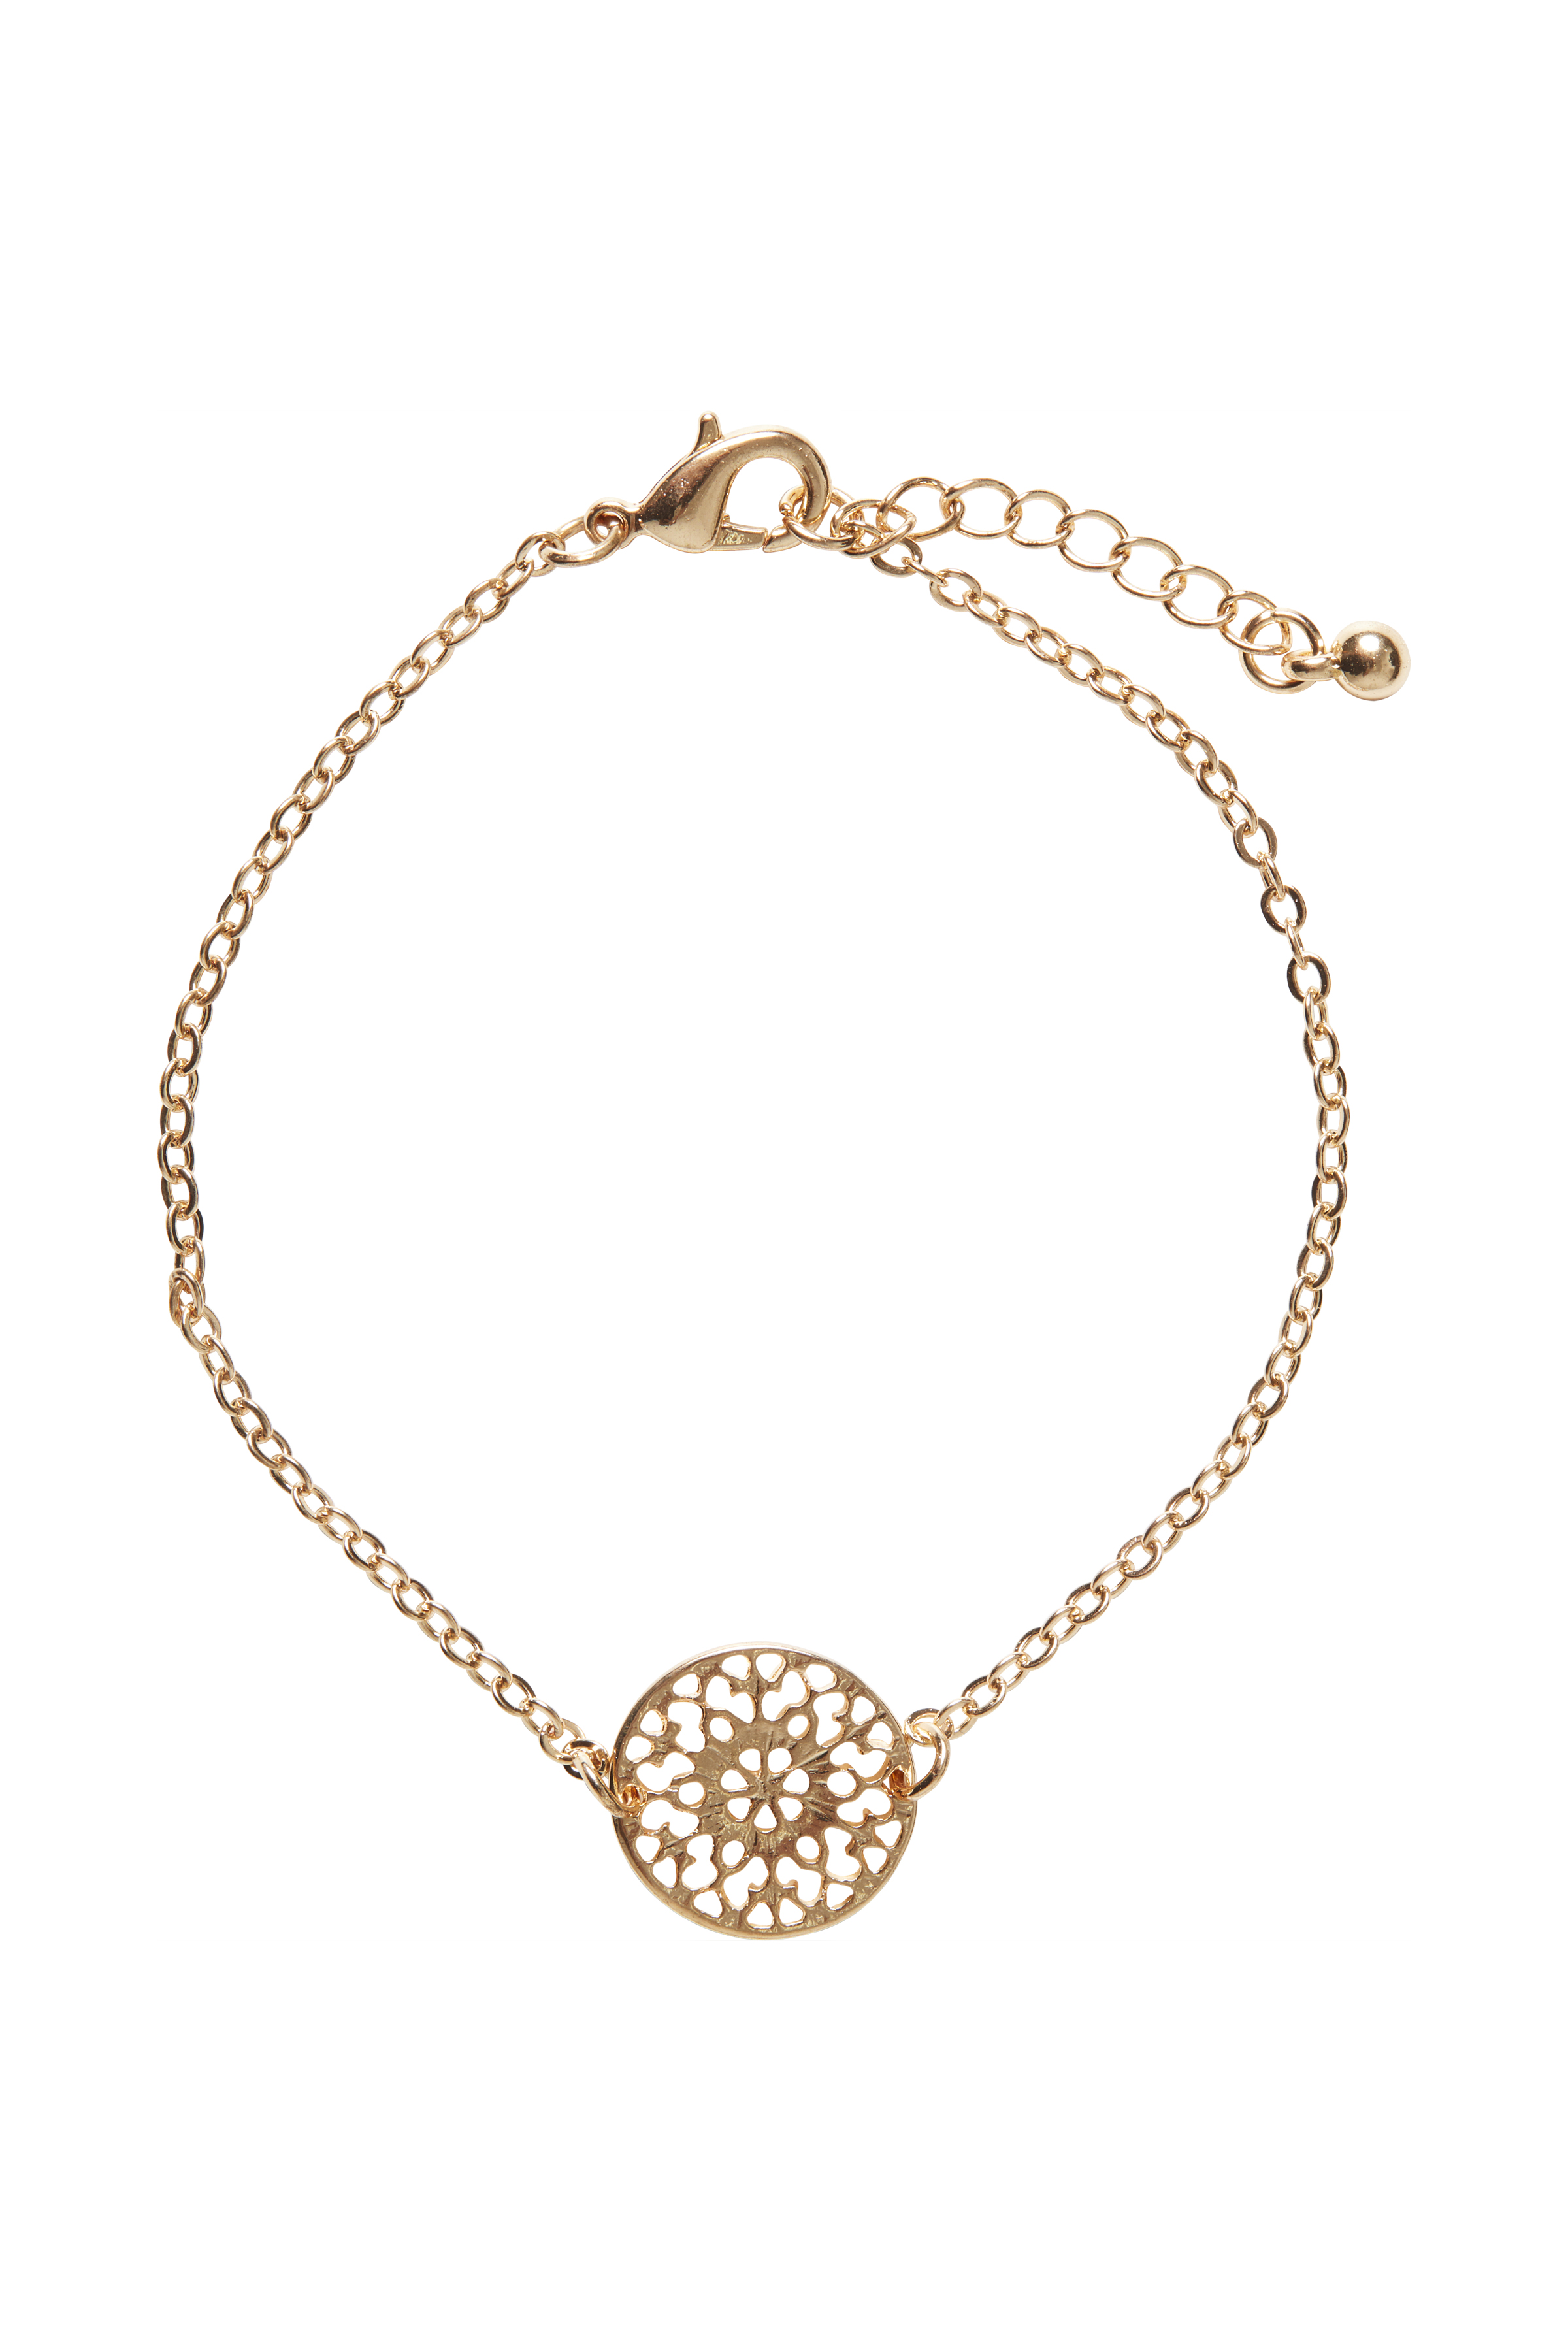 Fransa Dame Armband - Goud